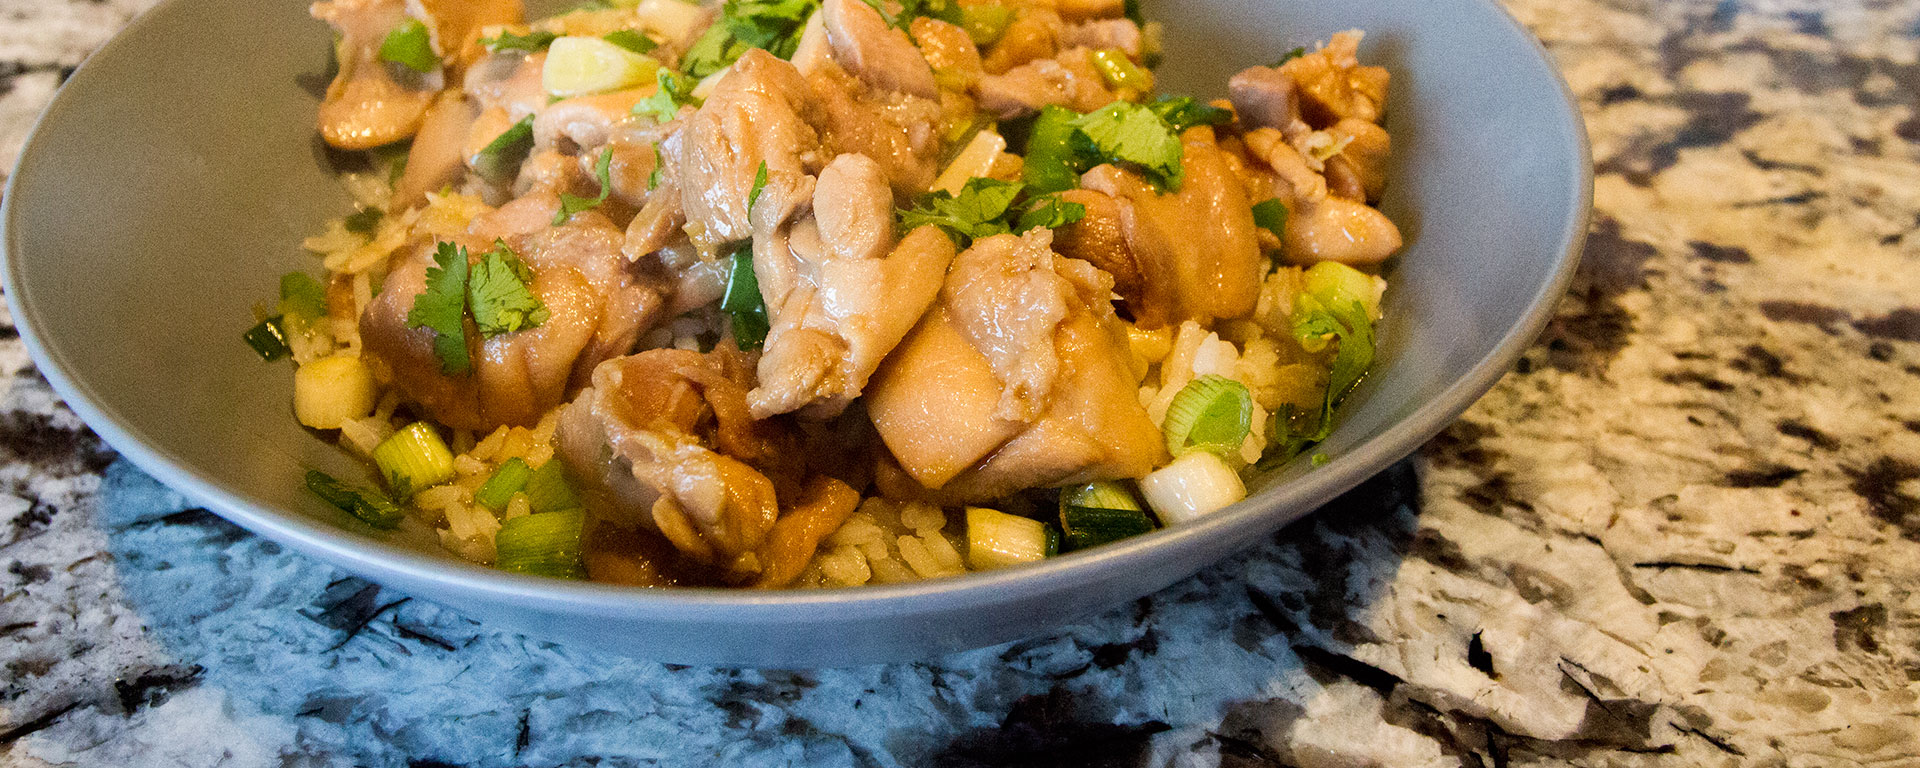 Ingredients-Caramel-Chicken-POLYWOOD